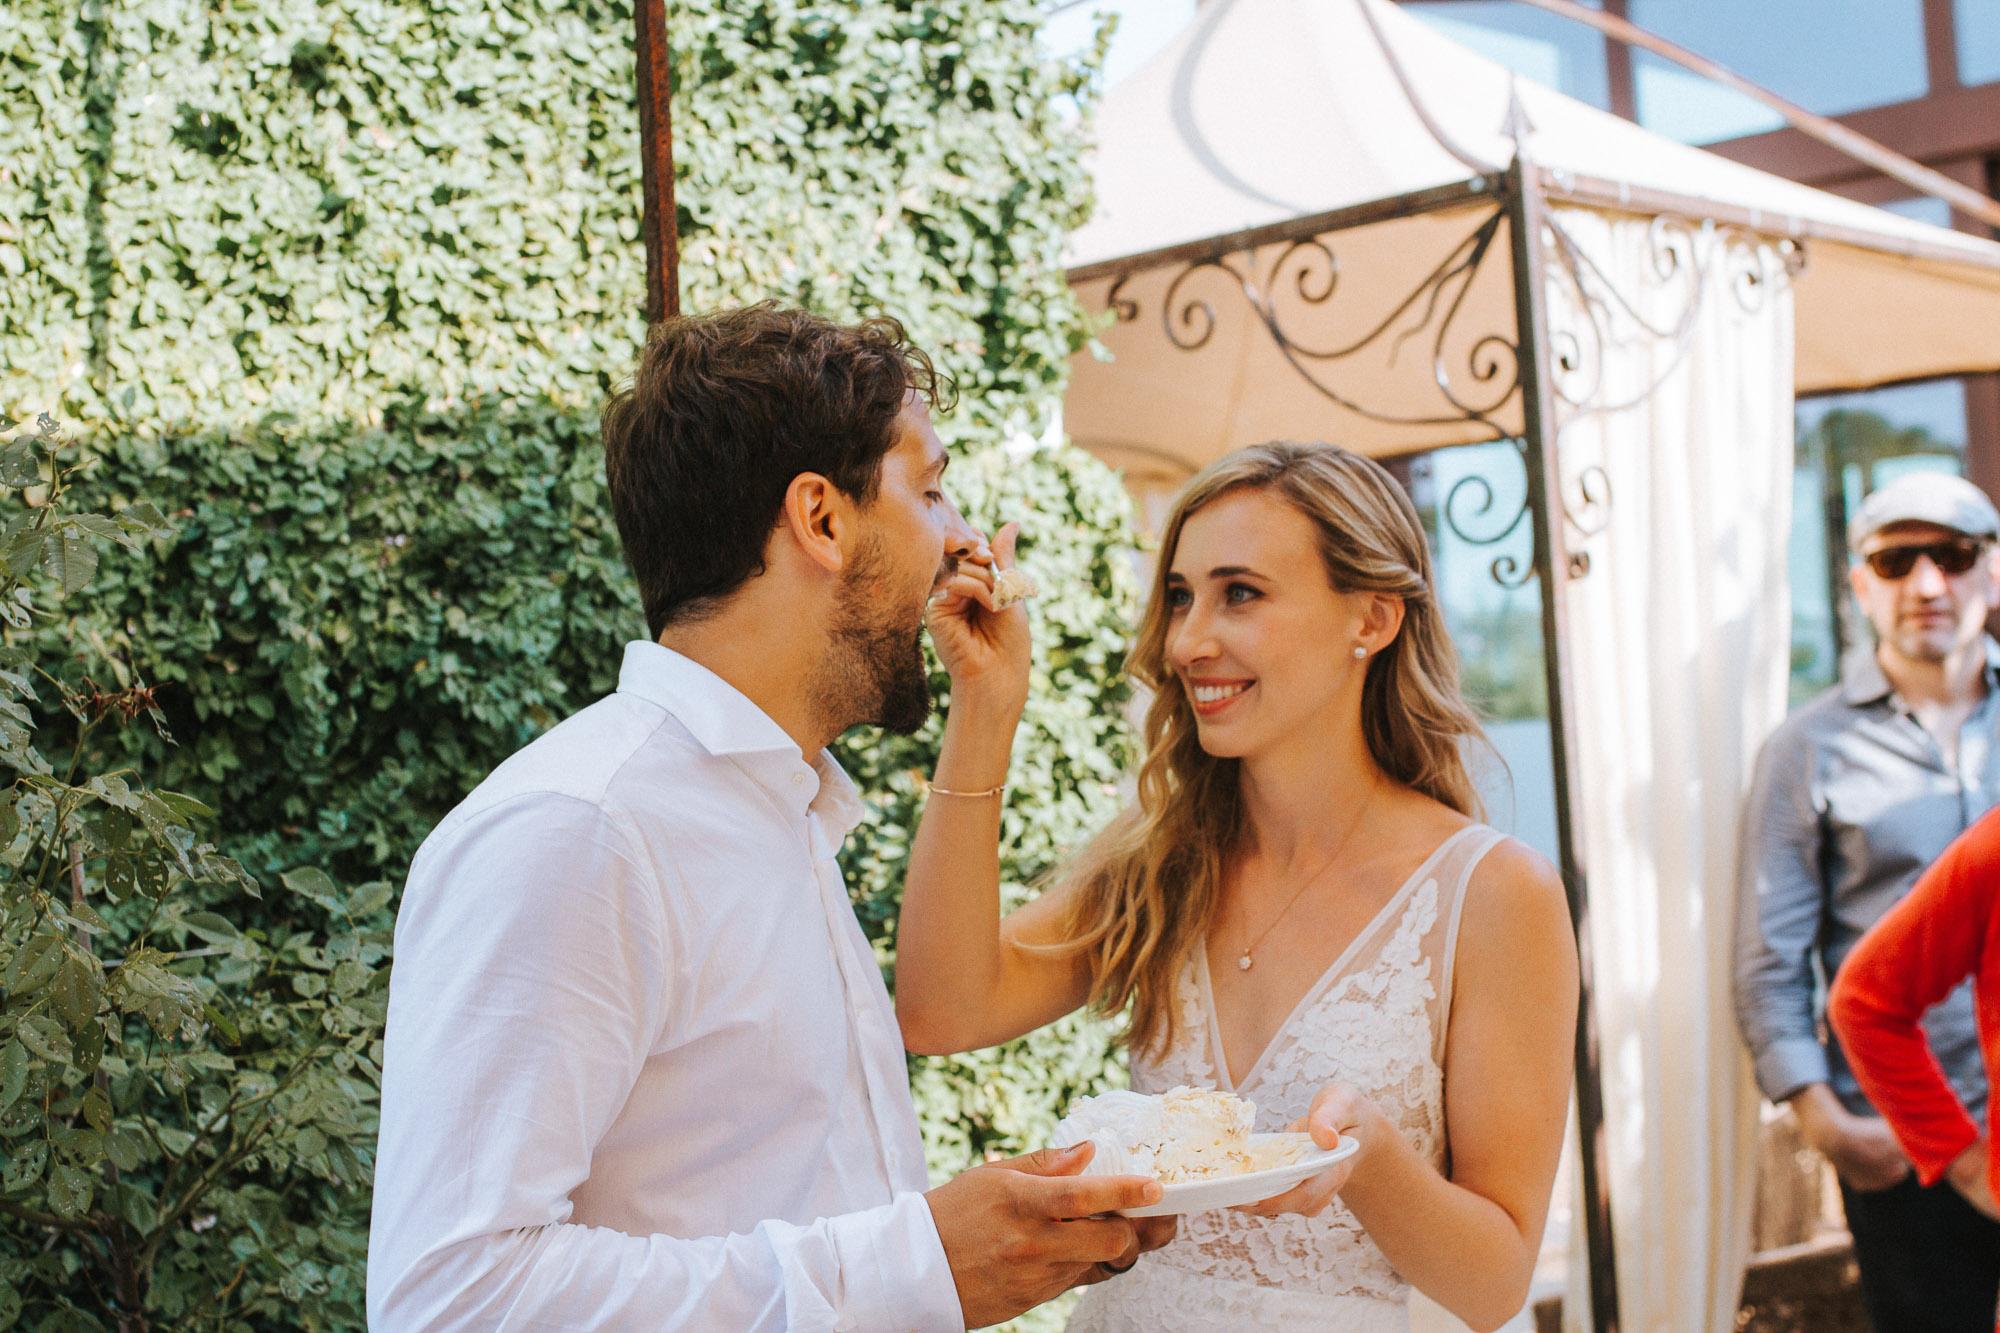 20180720-Memoryfactory-Sara&Jacopo-90- Hochzeit.jpg